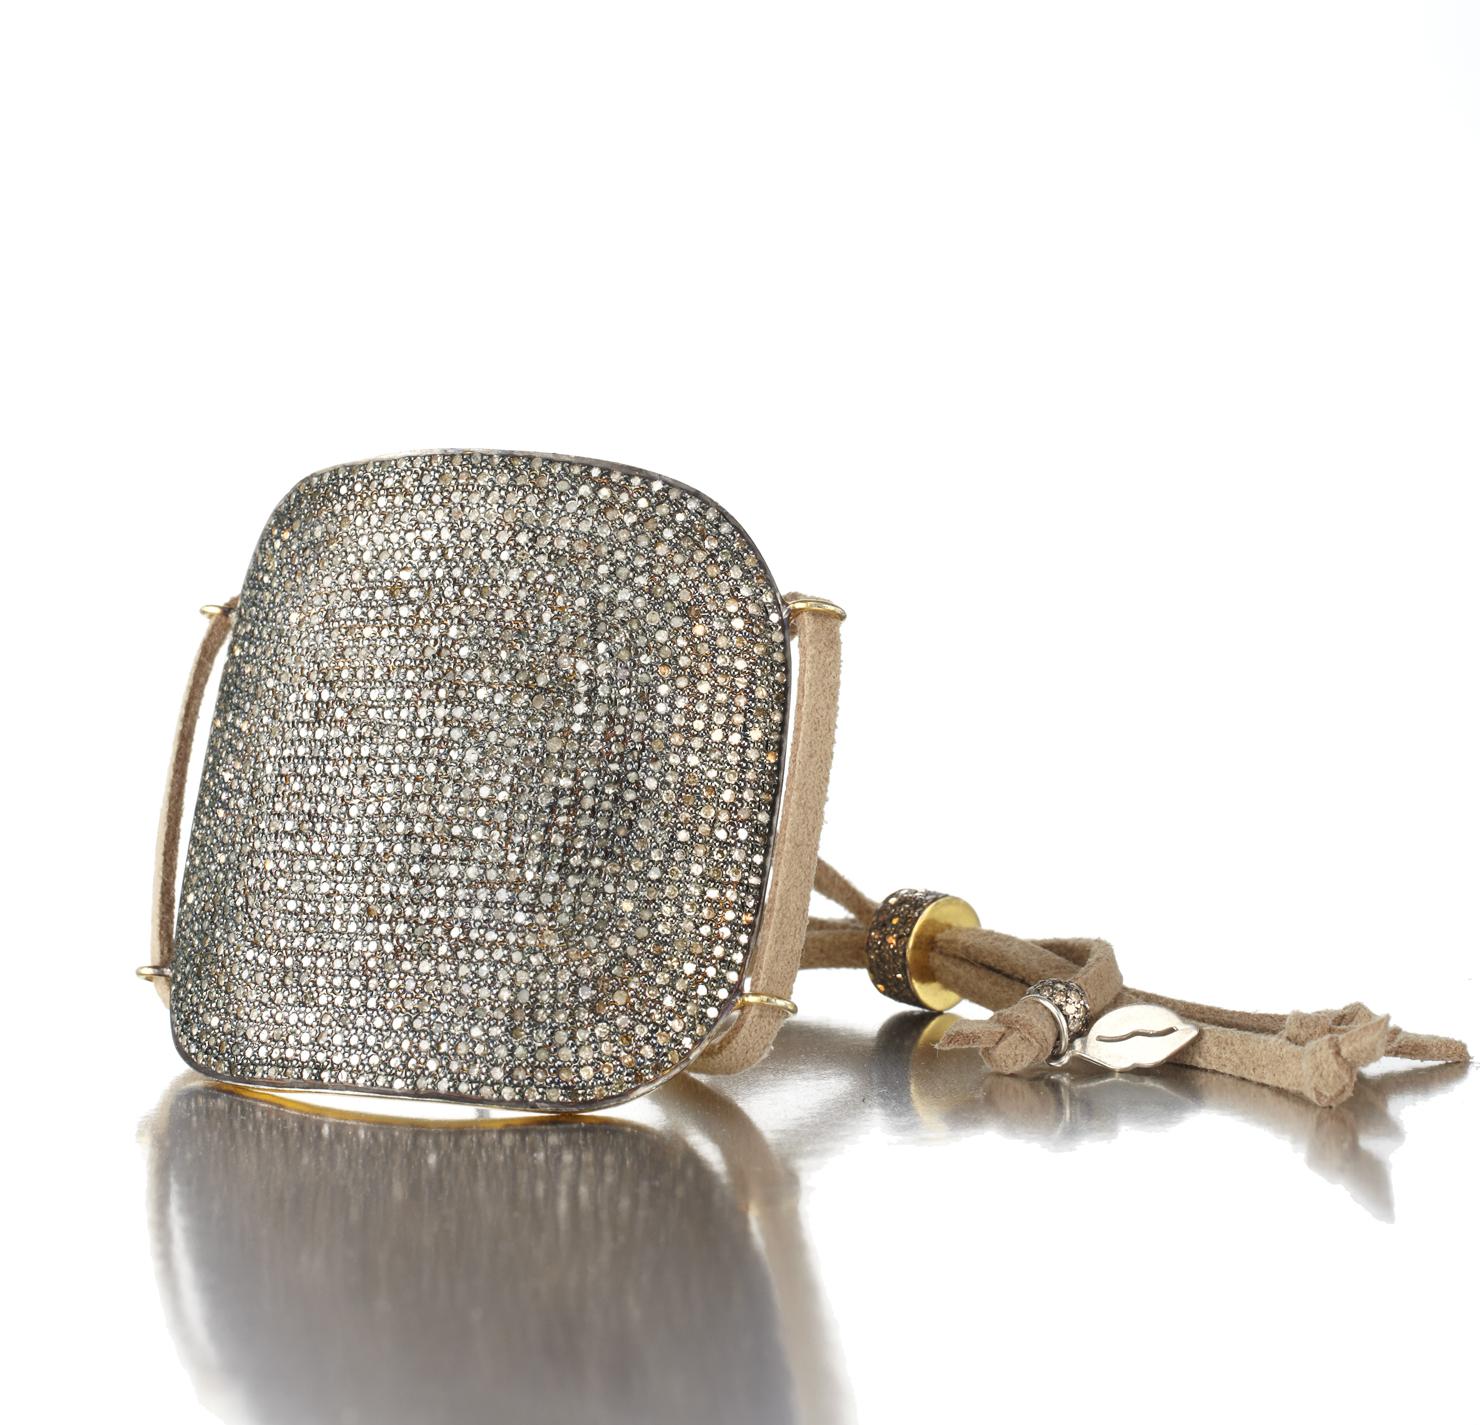 Suede Bracelet with cuff 17672.jpg